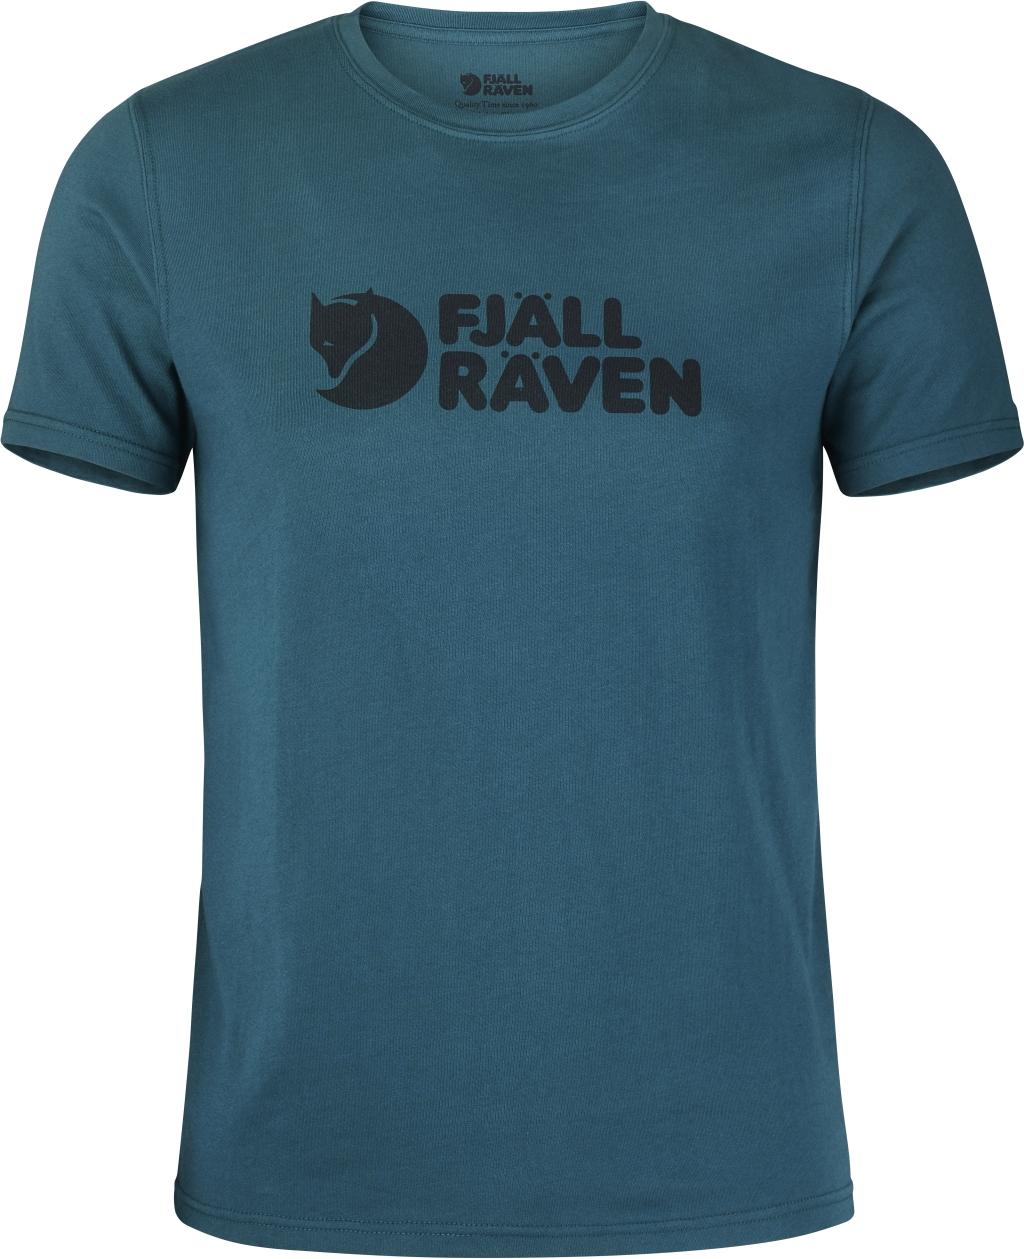 FjallRaven Logo T-shirt Glacier Green-30